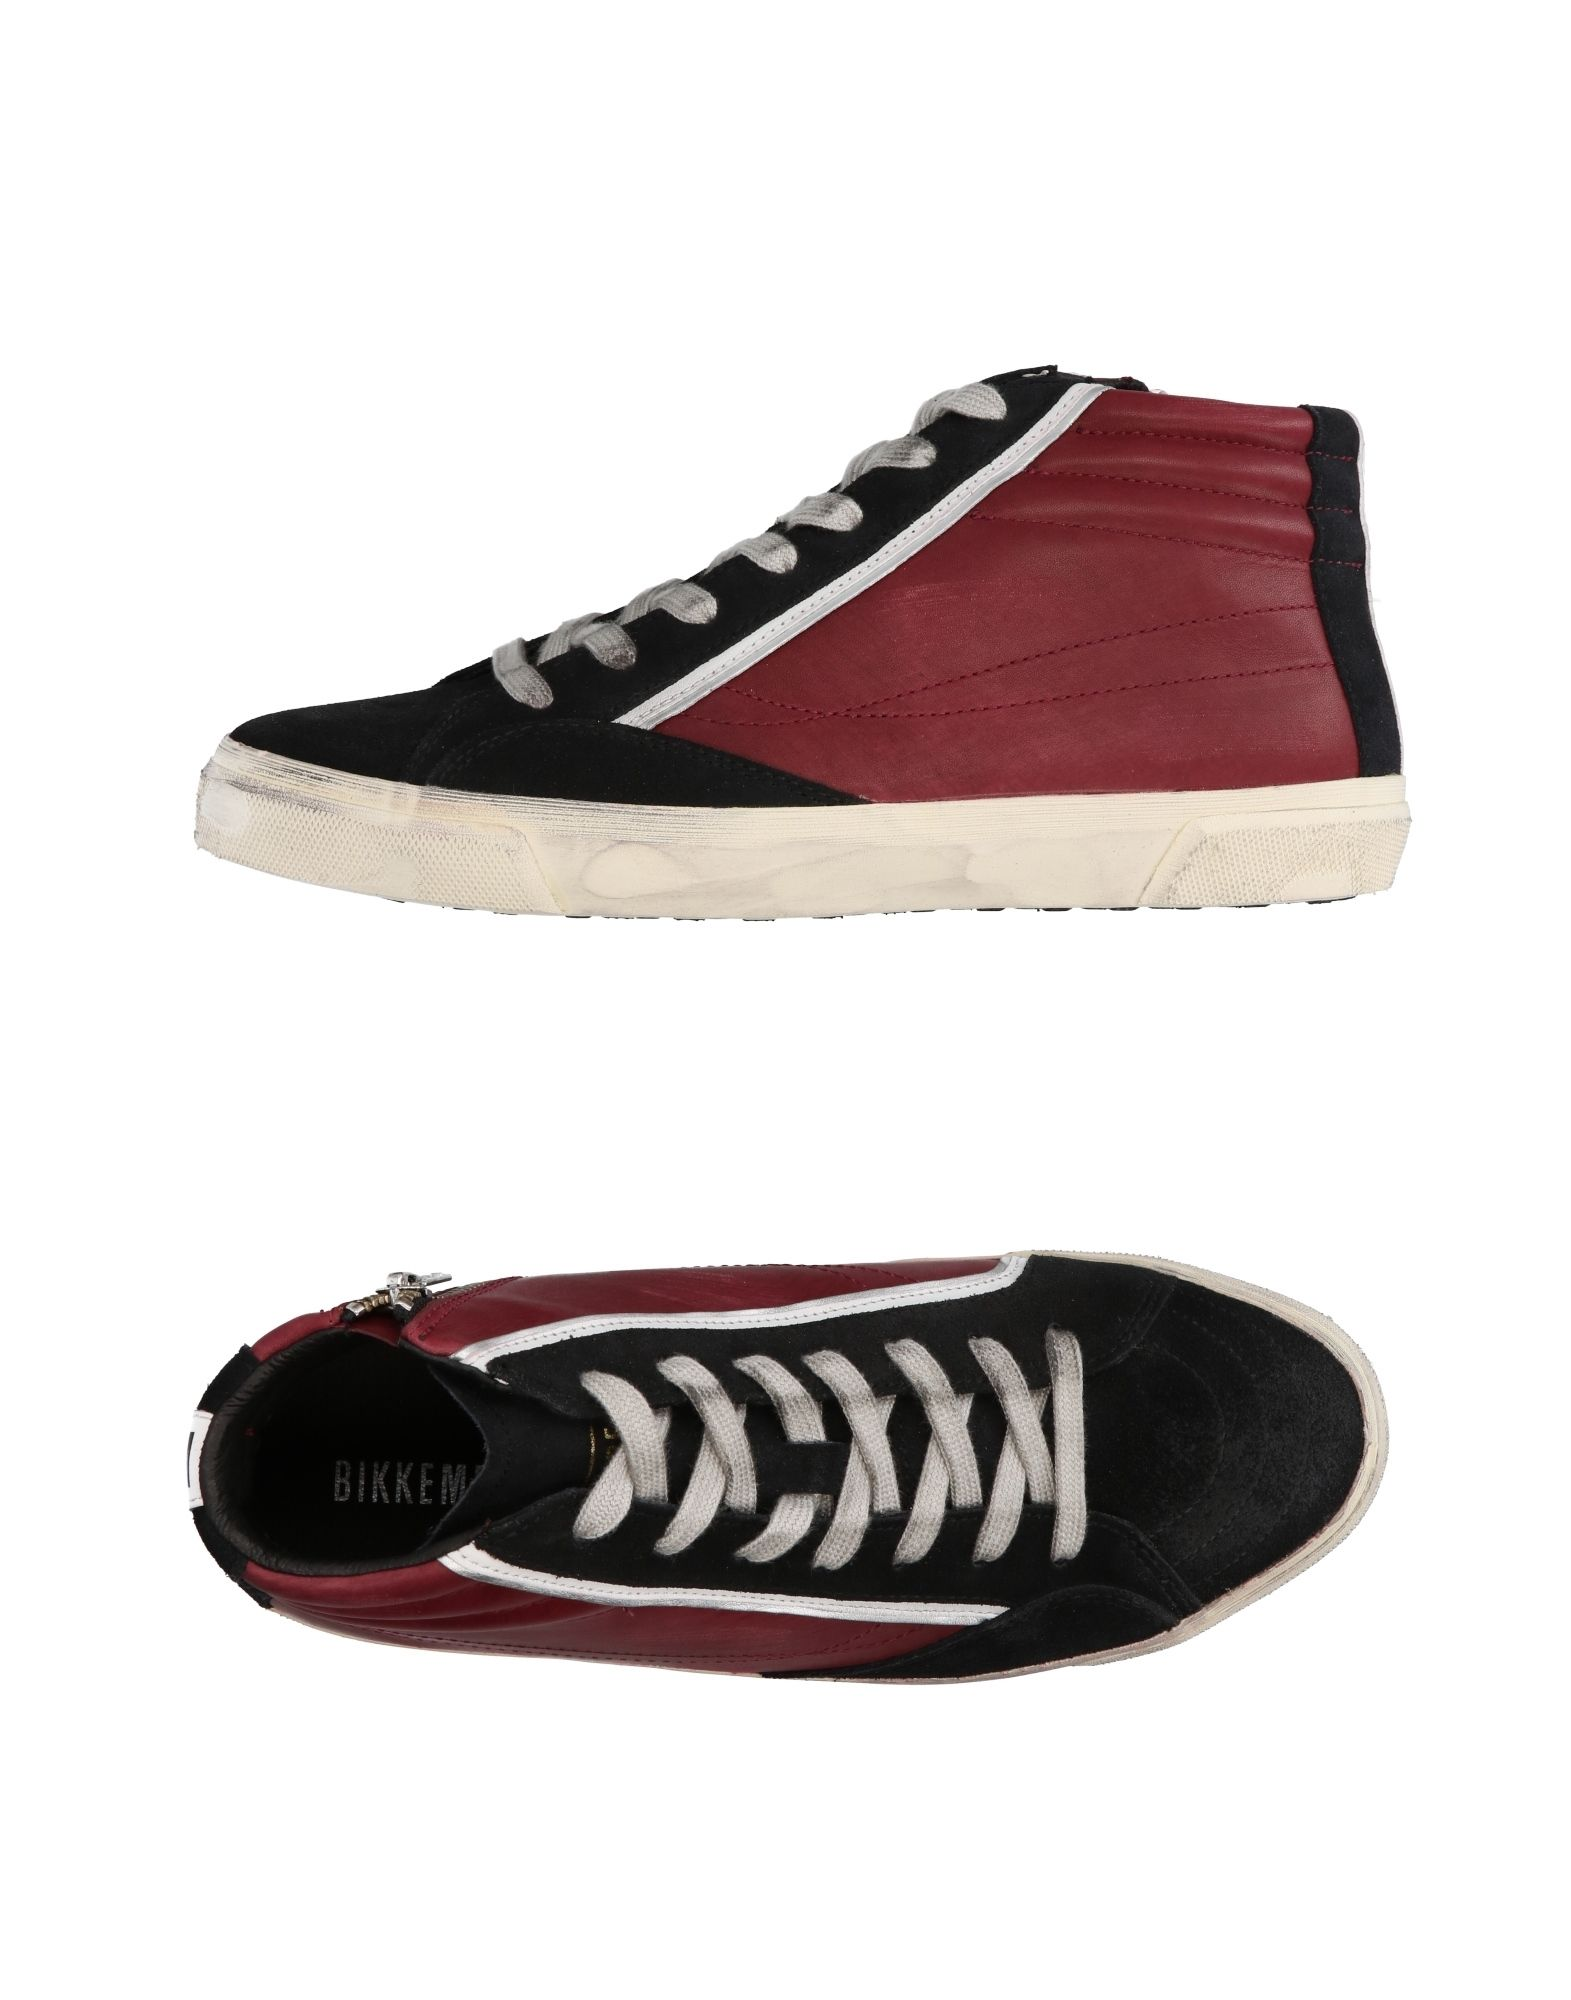 11284489FA Bikkembergs Sneakers Herren  11284489FA  9f881f